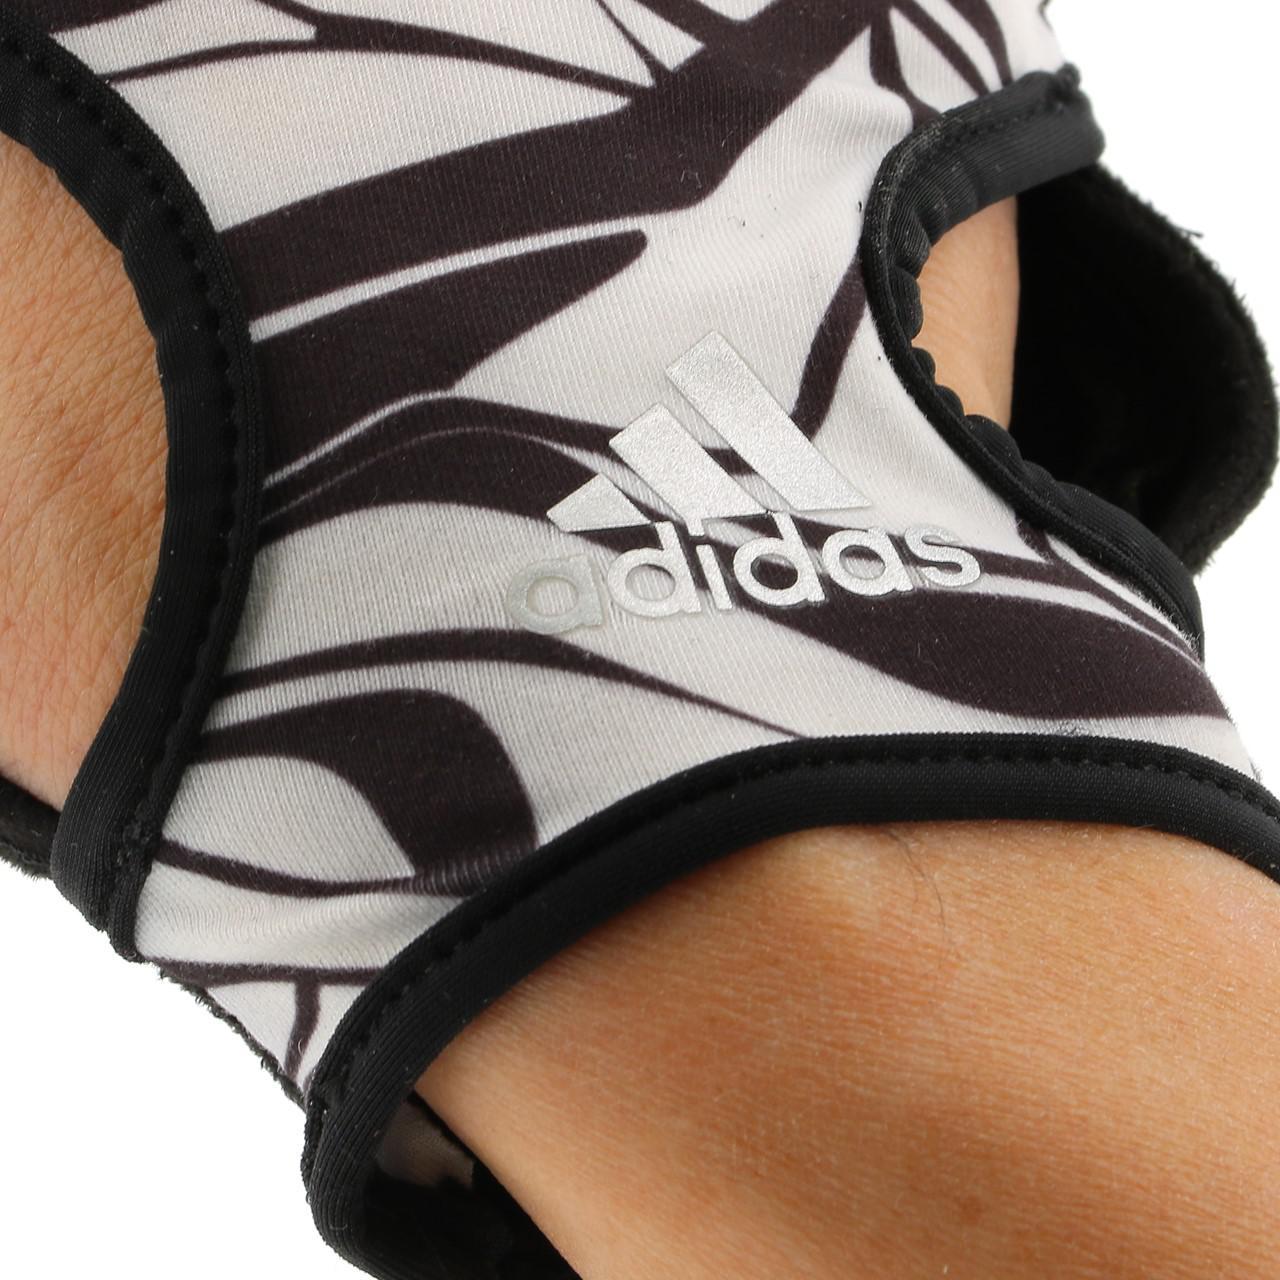 Mitaine-Adidas-Clite-training-femme-Blanc-49309-Neuf miniature 2